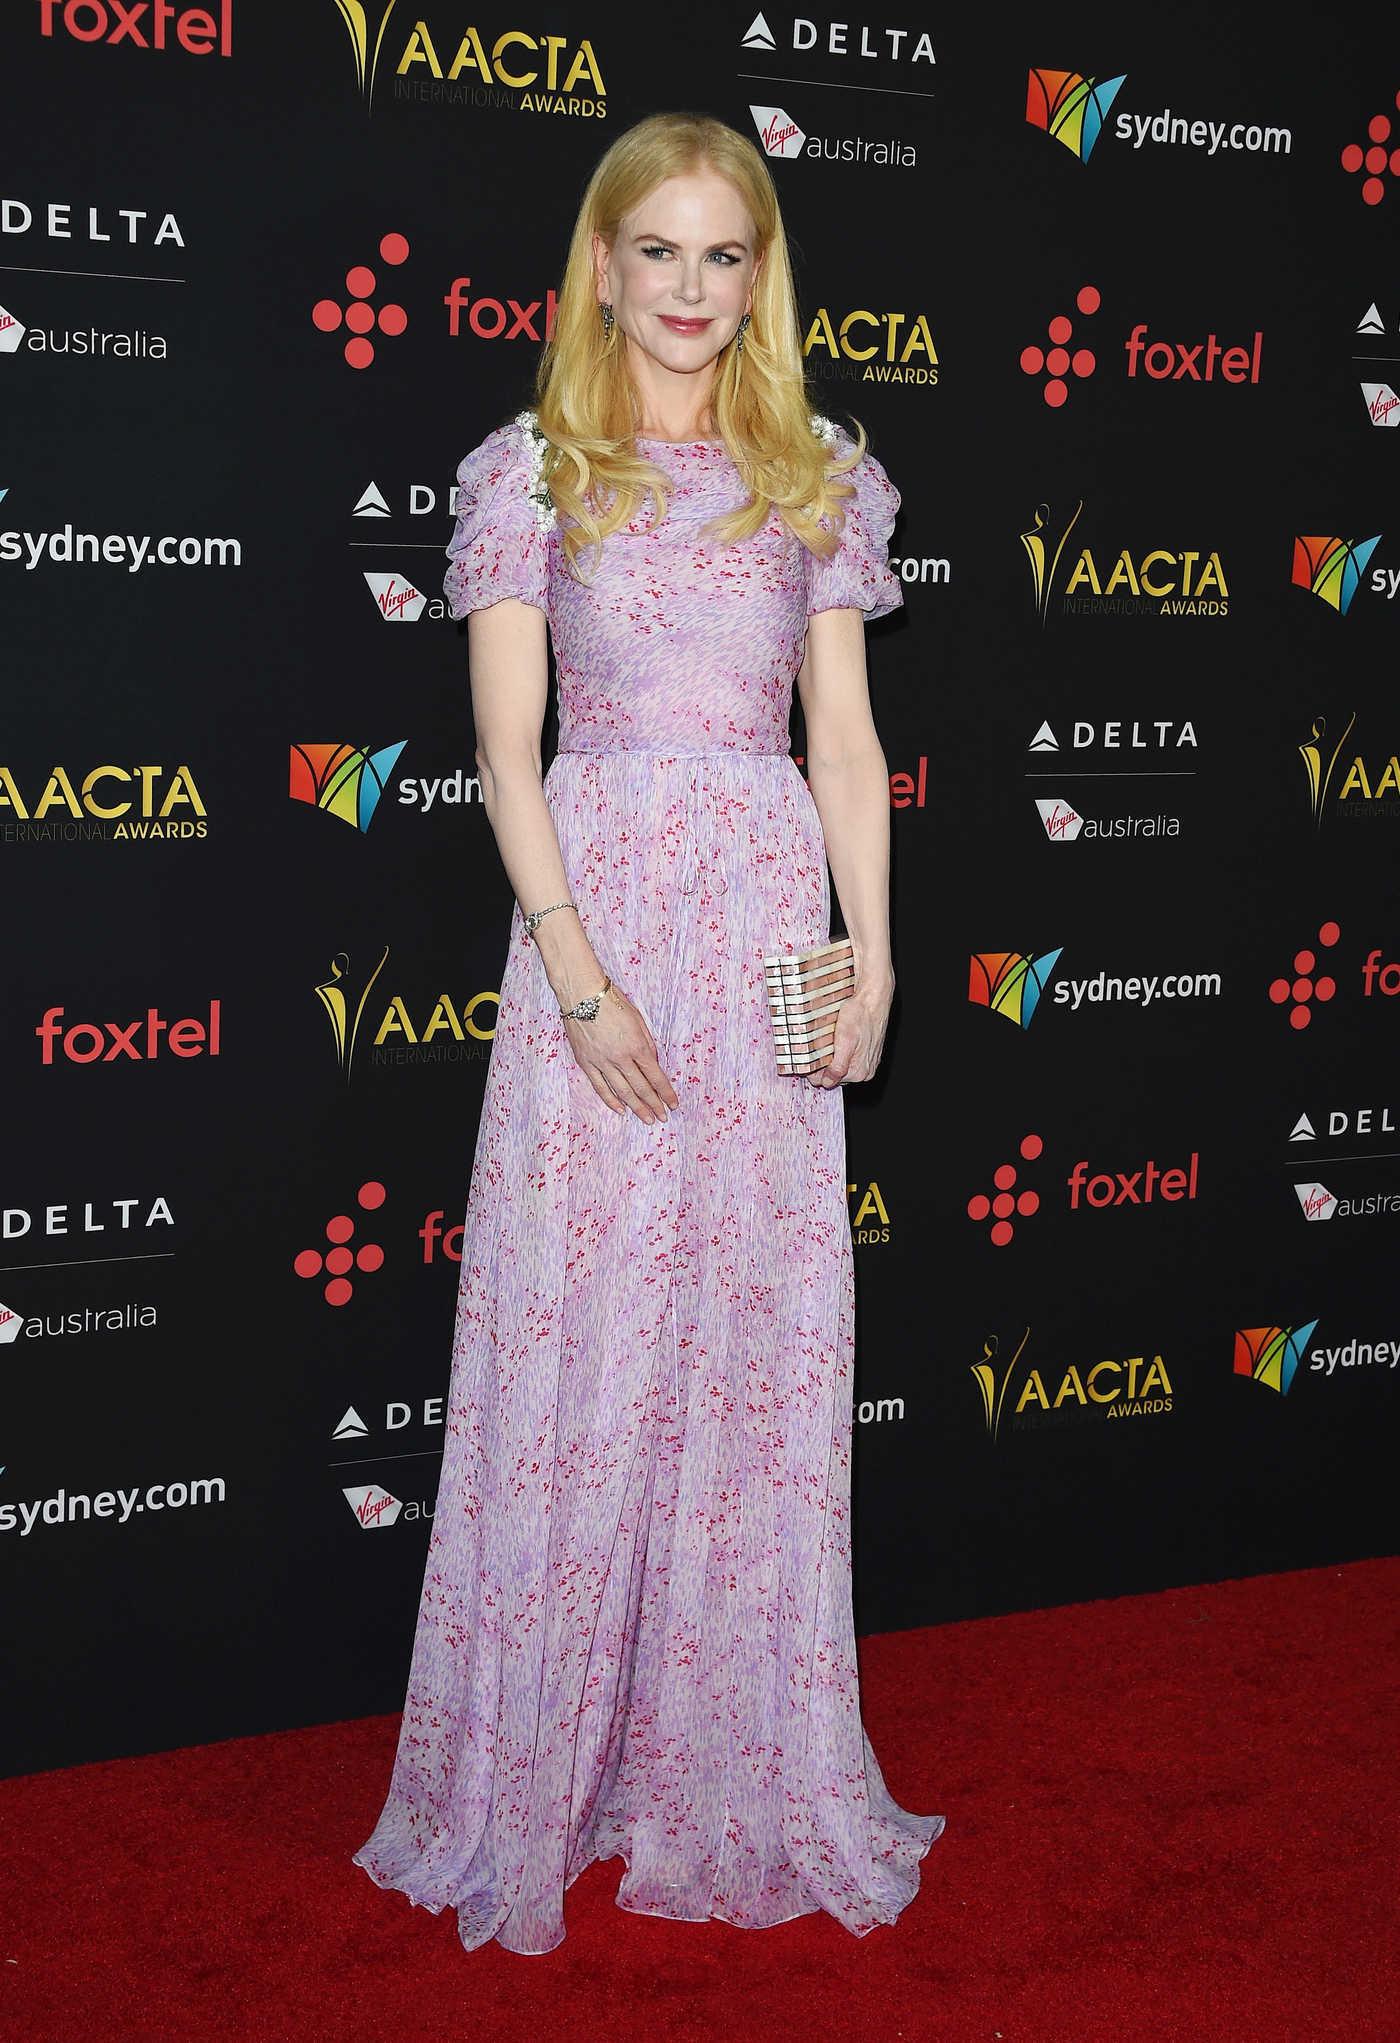 Nicole Kidman at the 7th AACTA International Awards in Los Angeles 01/05/2018